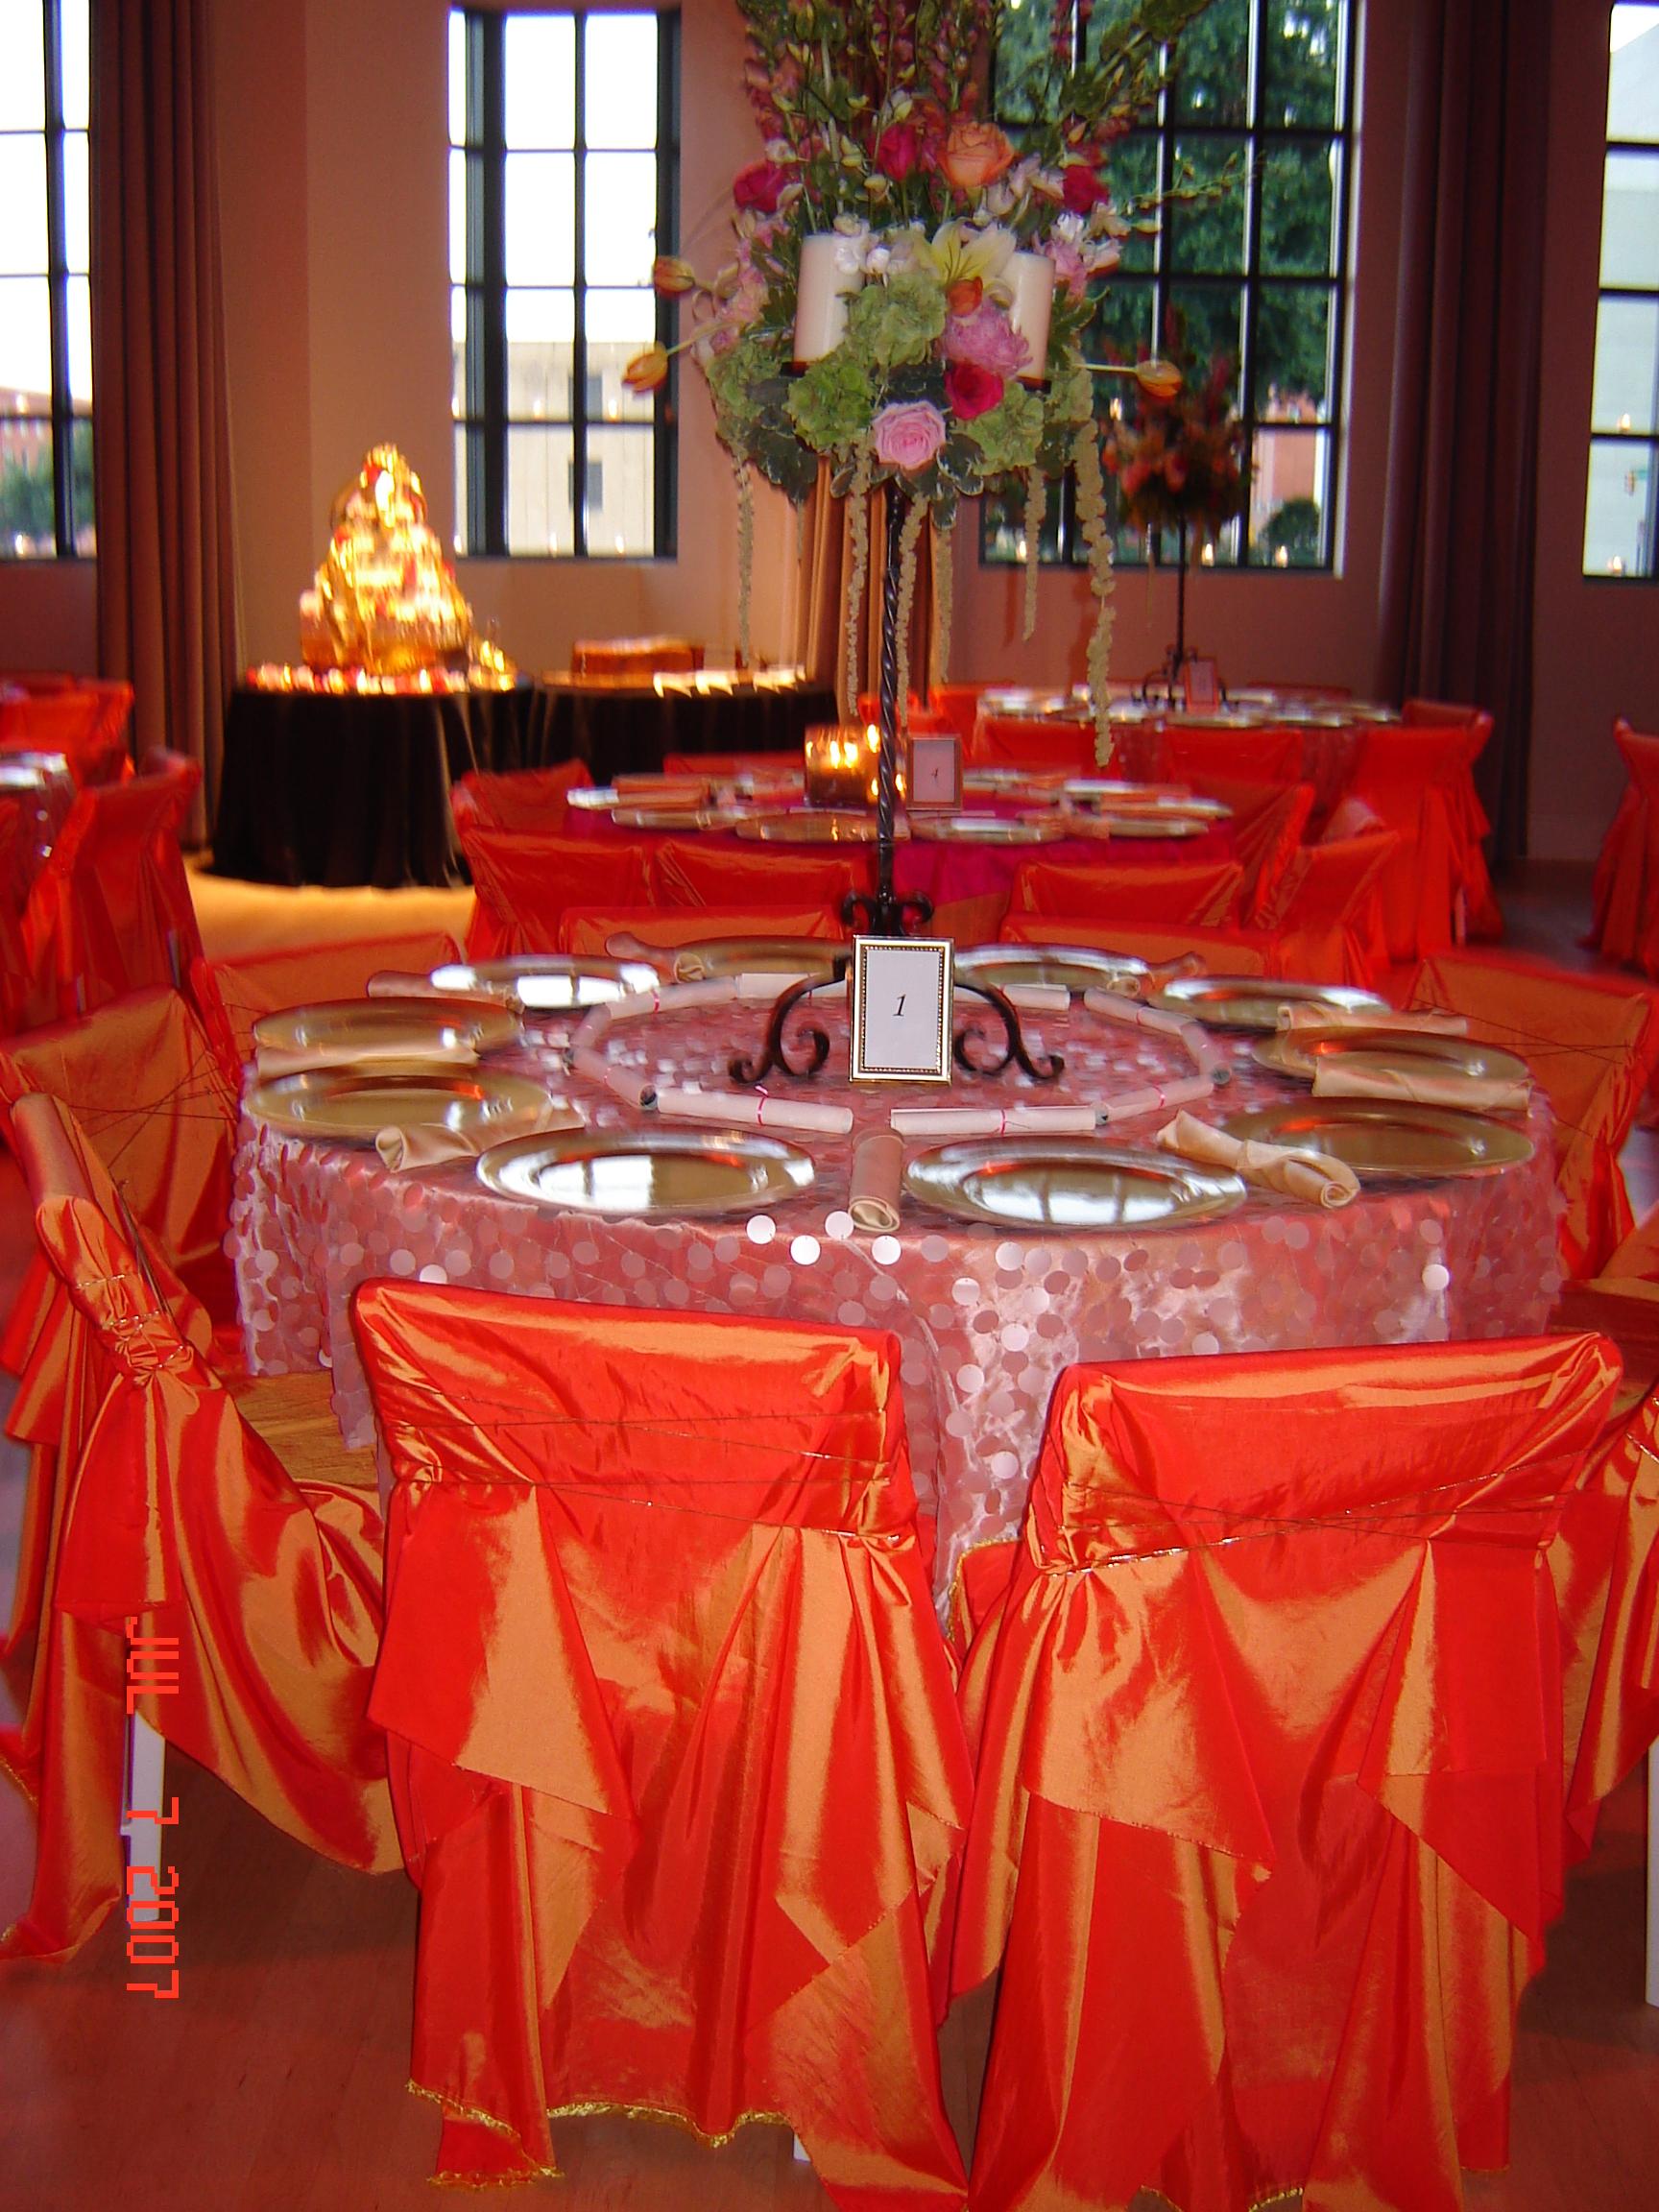 chair cover rentals dallas texas hanging vintage simply elegant weddings wedding supplies fort worth tx